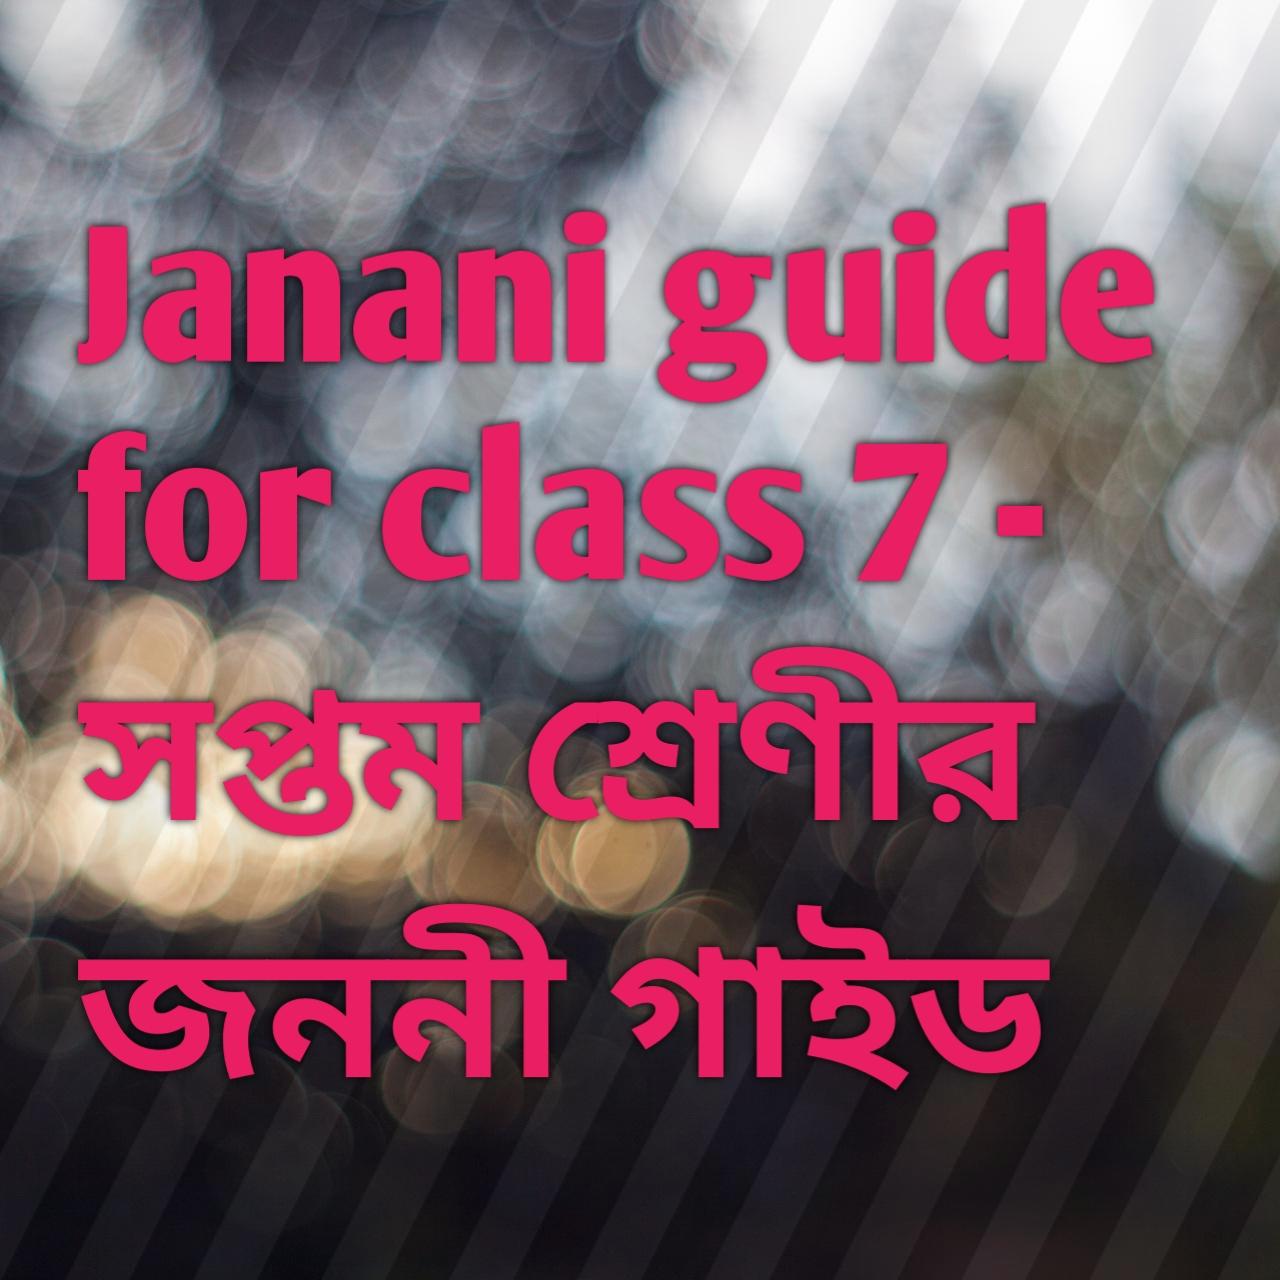 class 7 janani guide 2021, class 7 janani guide pdf, class 7 janani guide book 2021, class 7 math solution janani guide, janani guide class 7, janani guide for class 7, janani guide for class 7 english, janani guide for class 7 math, janani guide for class 7 science, janani guide for class 7 Bangladesh and global studies, janani guide for class 7, janani guide for class 7 hindu dharma, janani guide for class 7 ICT, janani guide for class 7 home science, janani guide for class 7 agriculture education, janani guide for class physical education, সপ্তম শ্রেণীর বাংলা গাইড জননী ডাউনলোড, সপ্তম শ্রেণীর বাংলা গাইড এর পিডিএফ, সপ্তম শ্রেণির বাংলা জননী গাইড পিডিএফ ২০২১, সপ্তম শ্রেণীর জননী গাইড ২০২১, সপ্তম শ্রেণির ইংরেজি জননী গাইড, সপ্তম শ্রেণীর গণিত জননী গাইড, সপ্তম শ্রেণীর জননী গাইড বিজ্ঞান, শ্রেণীর জননী গাইড বাংলাদেশ ও বিশ্বপরিচয়, সপ্তম শ্রেণীর জননী গাইড ইসলাম শিক্ষা, সপ্তম শ্রেণীর জননী গাইড হিন্দুধর্ম, সপ্তম শ্রেণীর জননী গাইড গার্হস্থ্য বিজ্ঞান, সপ্তম শ্রেণীর জননী গাইড কৃষি শিক্ষা, সপ্তম শ্রেণীর জননী গাইড তথ্য যোগাযোগ প্রযুক্তি, সপ্তম শ্রেণীর জননী গাইড শারীরিক শিক্ষা,